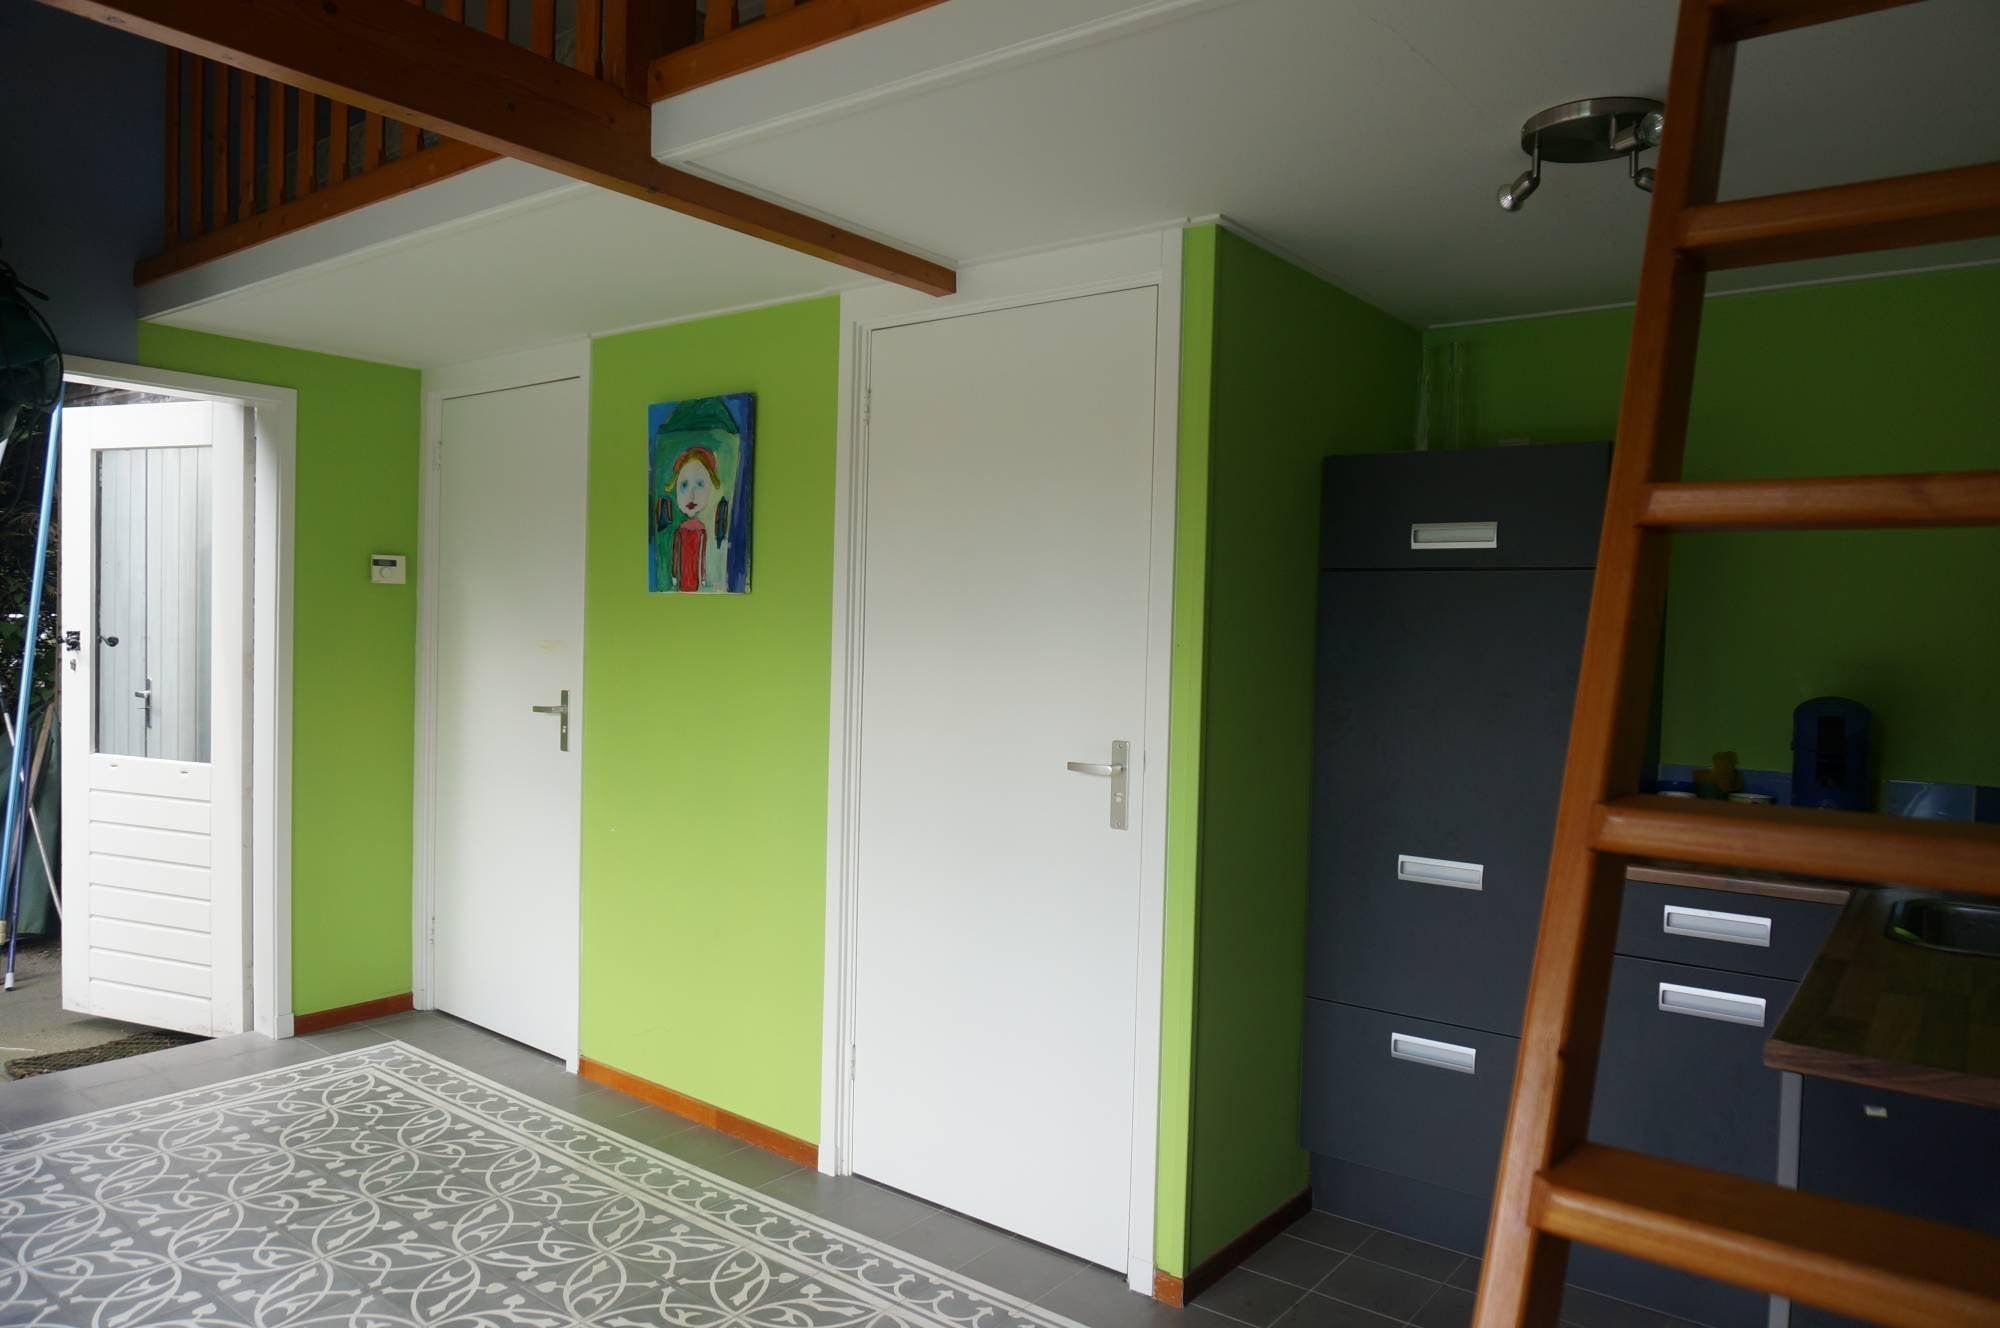 https://public.parariusoffice.nl/15/photos/huge/51155553.1489411539-693.JPG